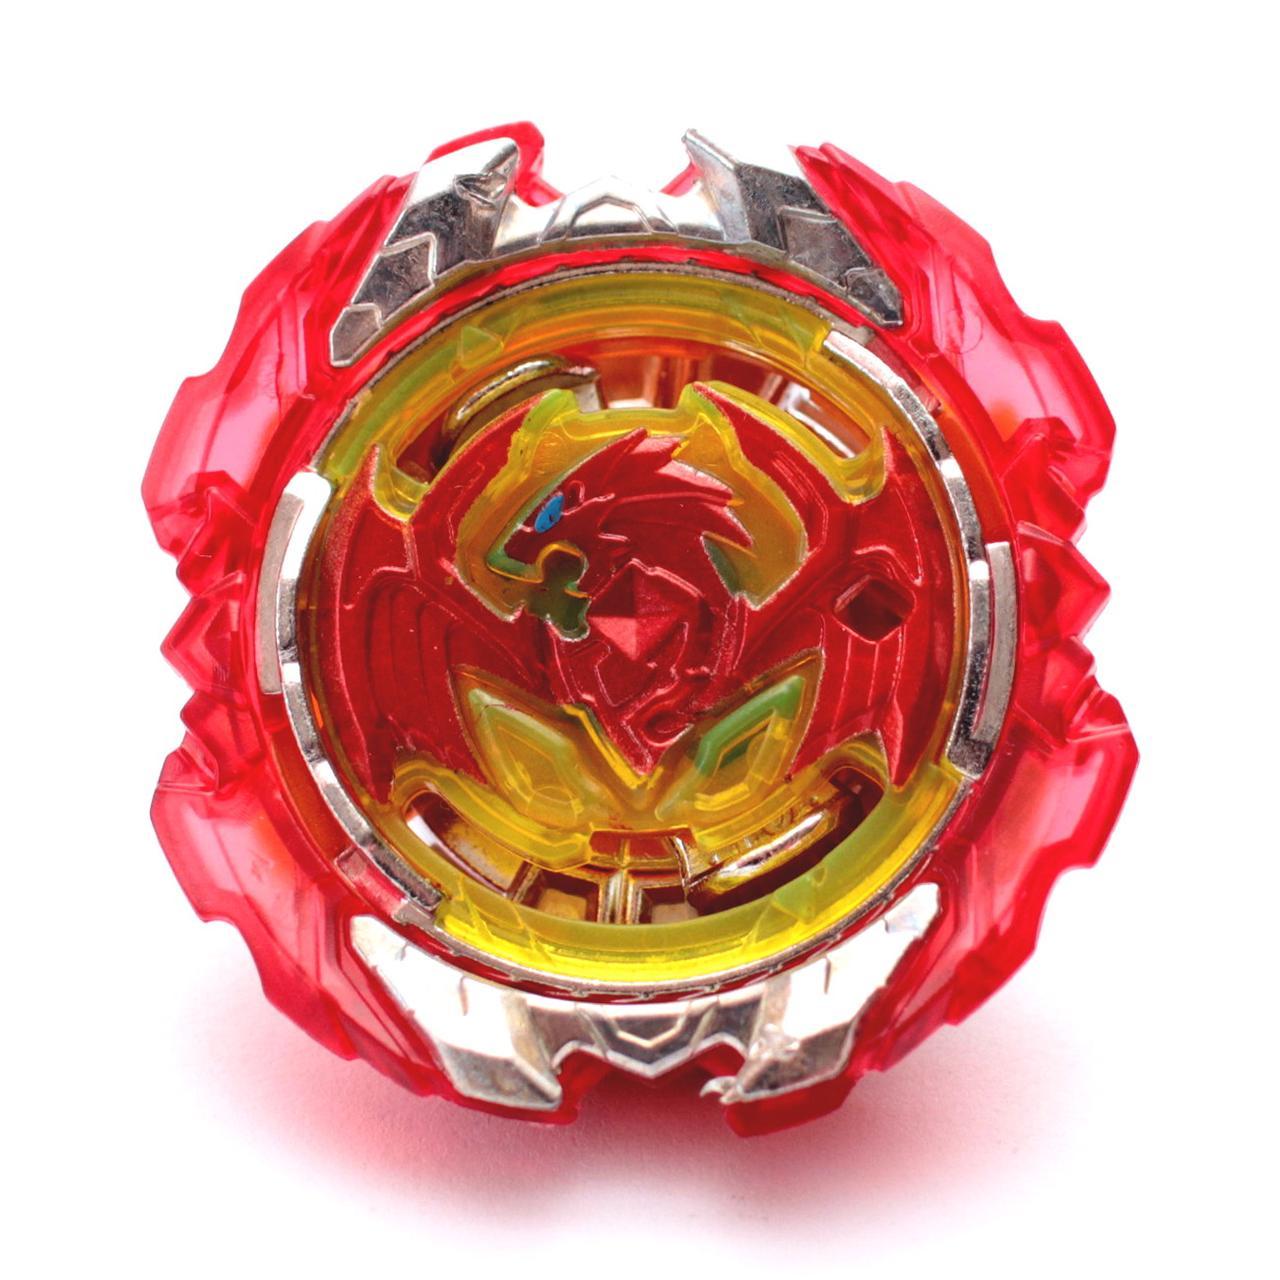 Волчок Бейблэйд Возрождающийся Феникс (Бейблейд 4сезон), Beyblade Revive Phoenix (Beyblade, И™)